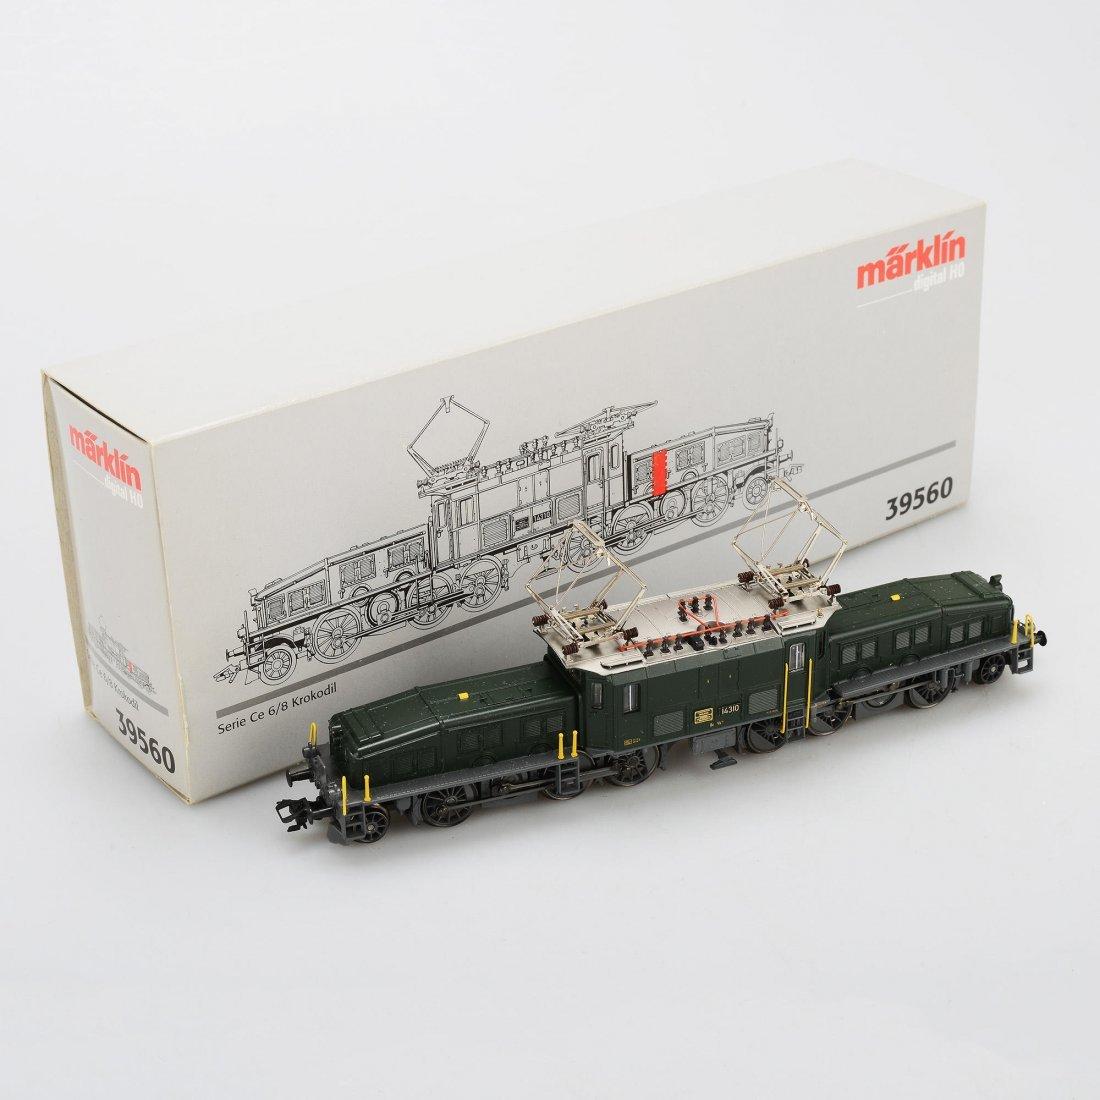 ELLOK, 39560, Marklin, Digital H0